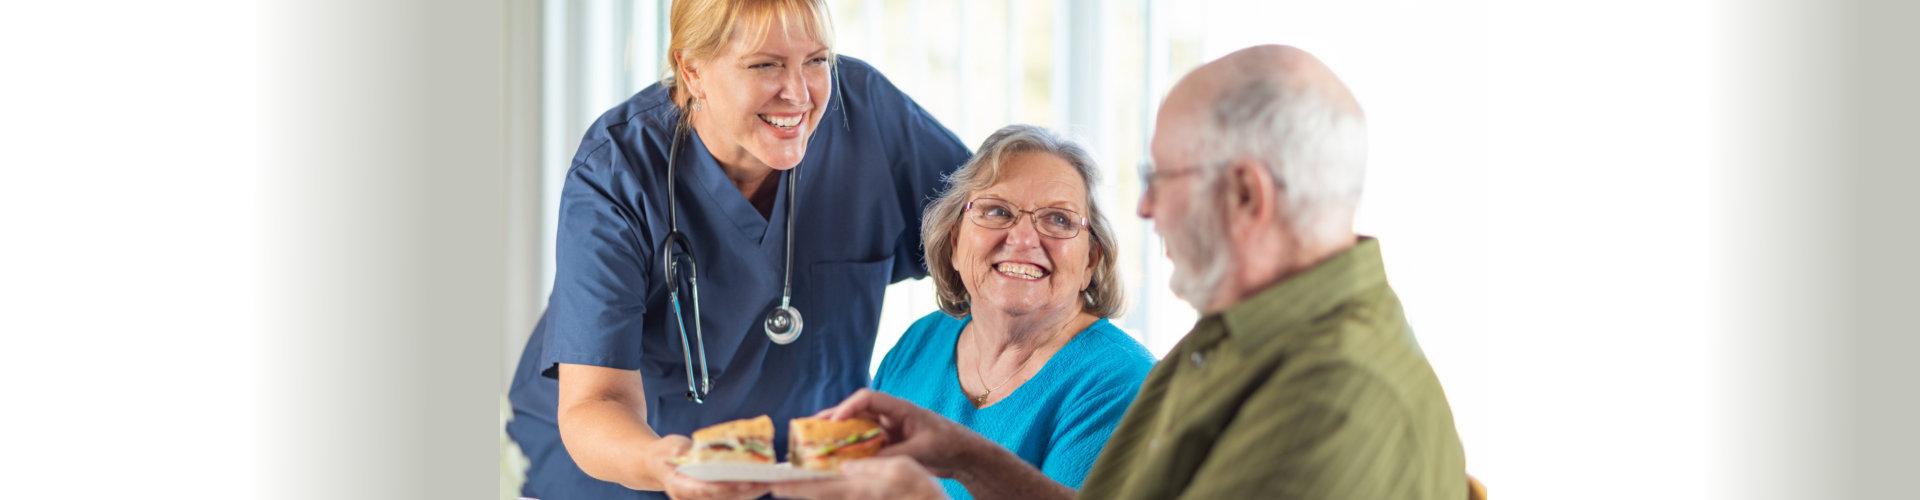 nurse serving senior couple